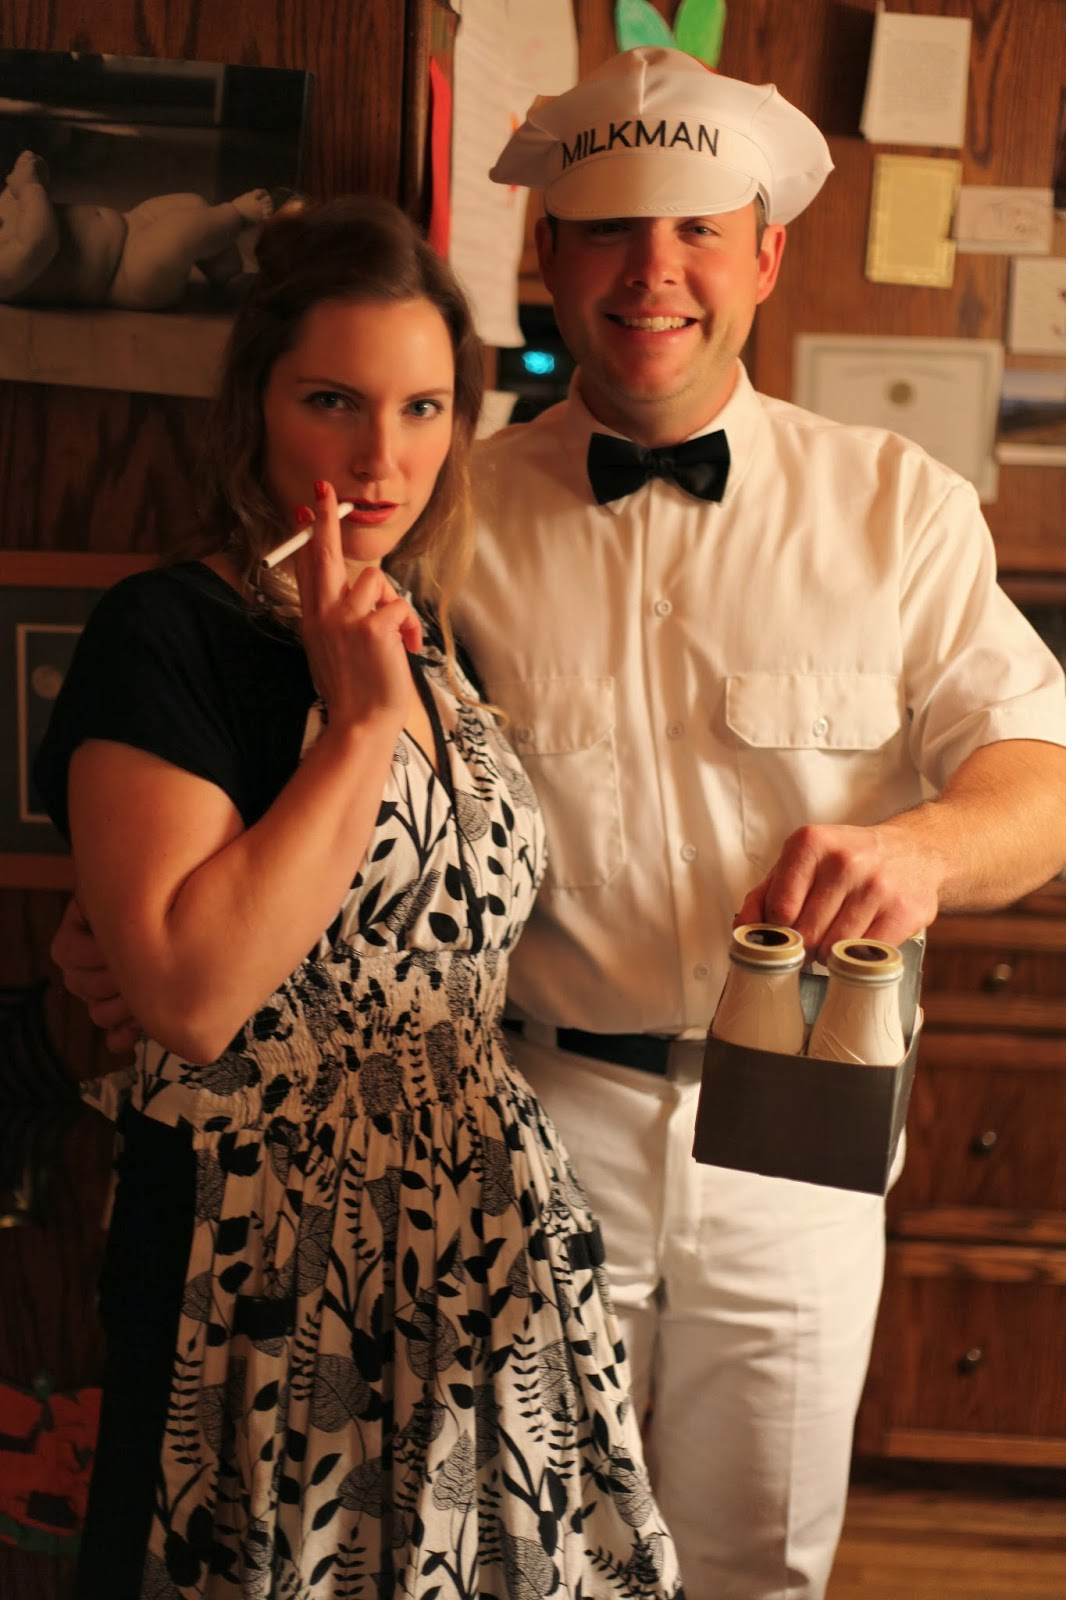 Wife And Milkman Costume Retro Milkman And Wife